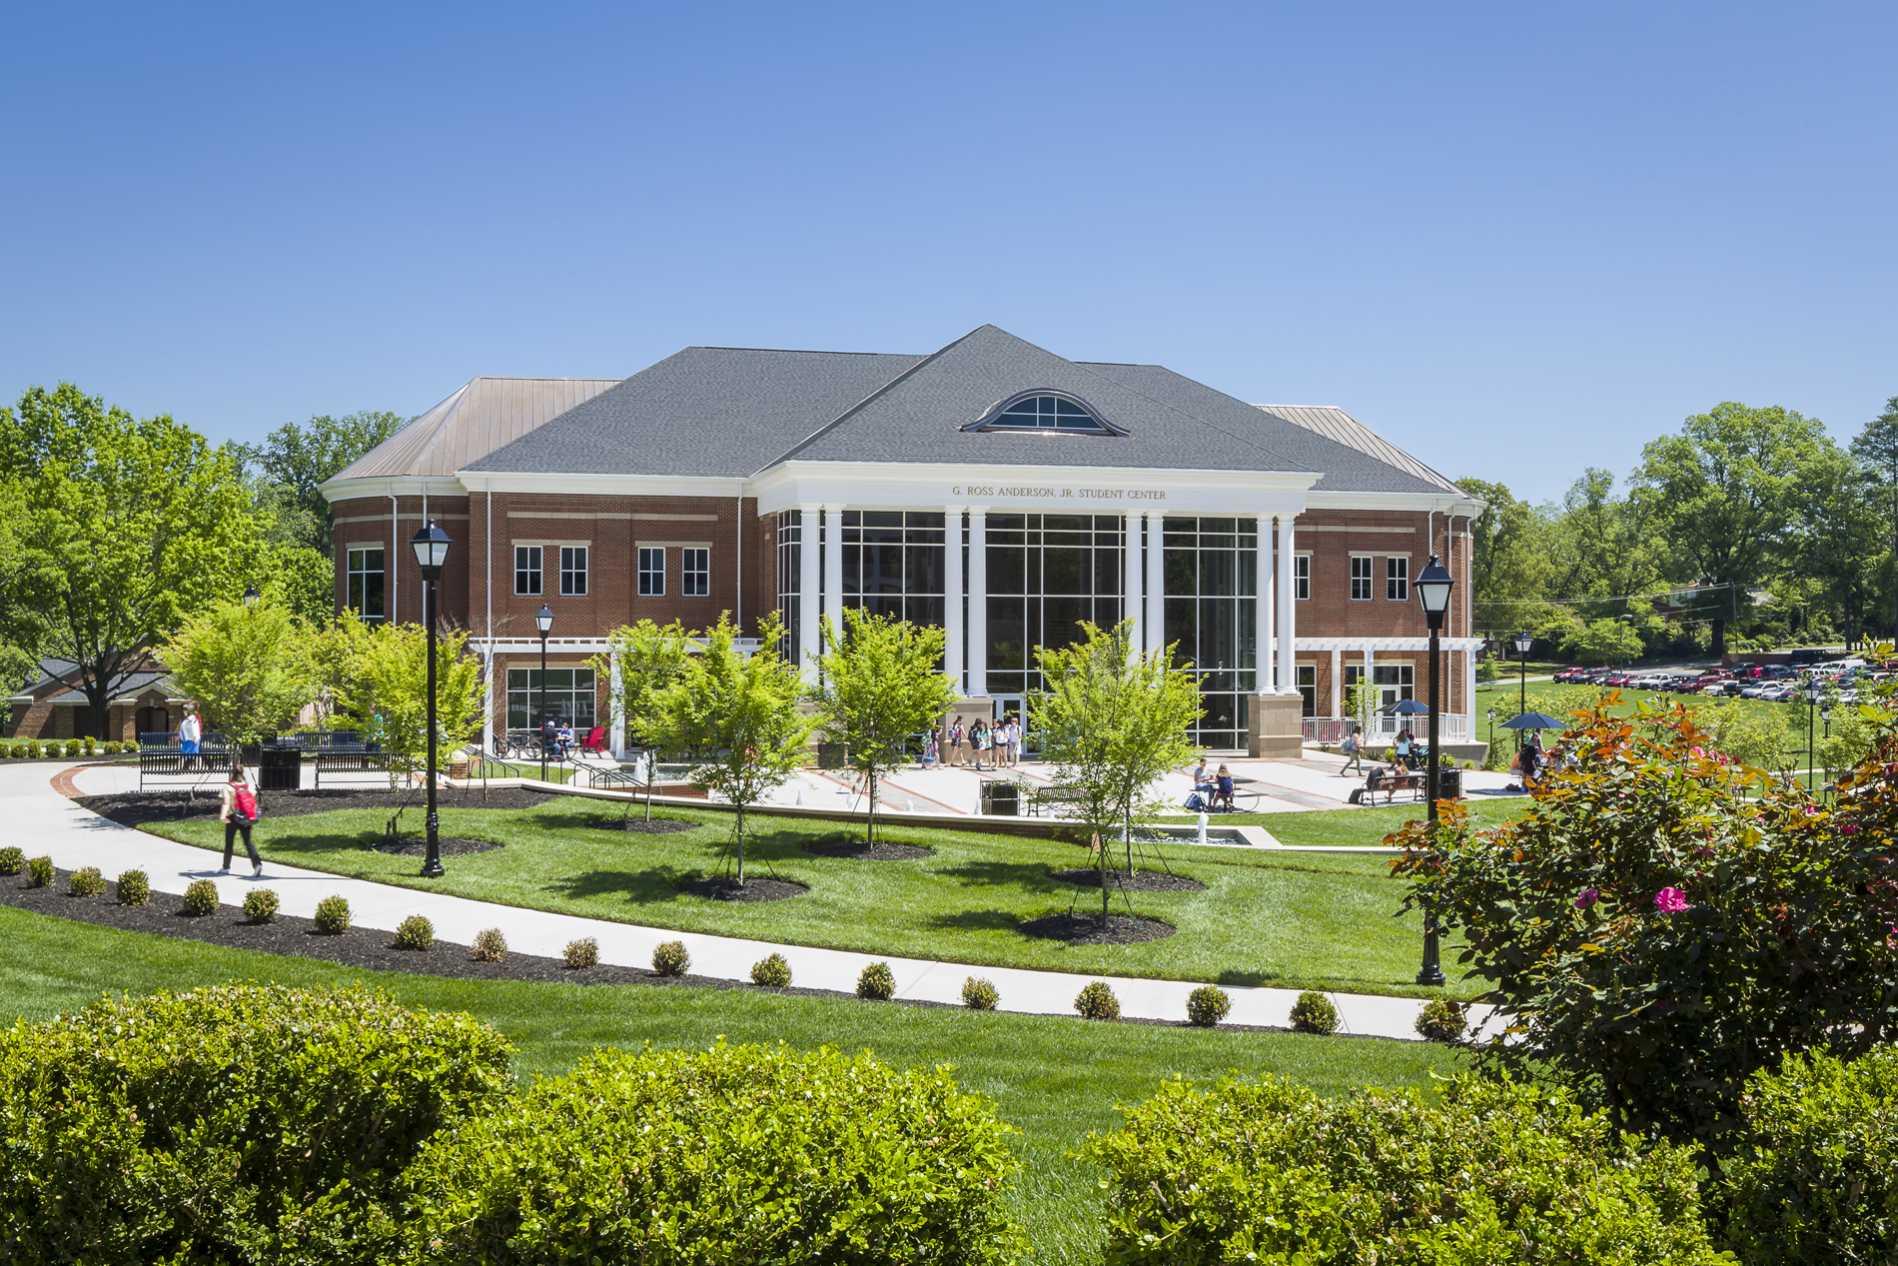 Legendary Homes Design Center Greenville Sc G Ross Anderson Jr Student Center Dp3 Architects